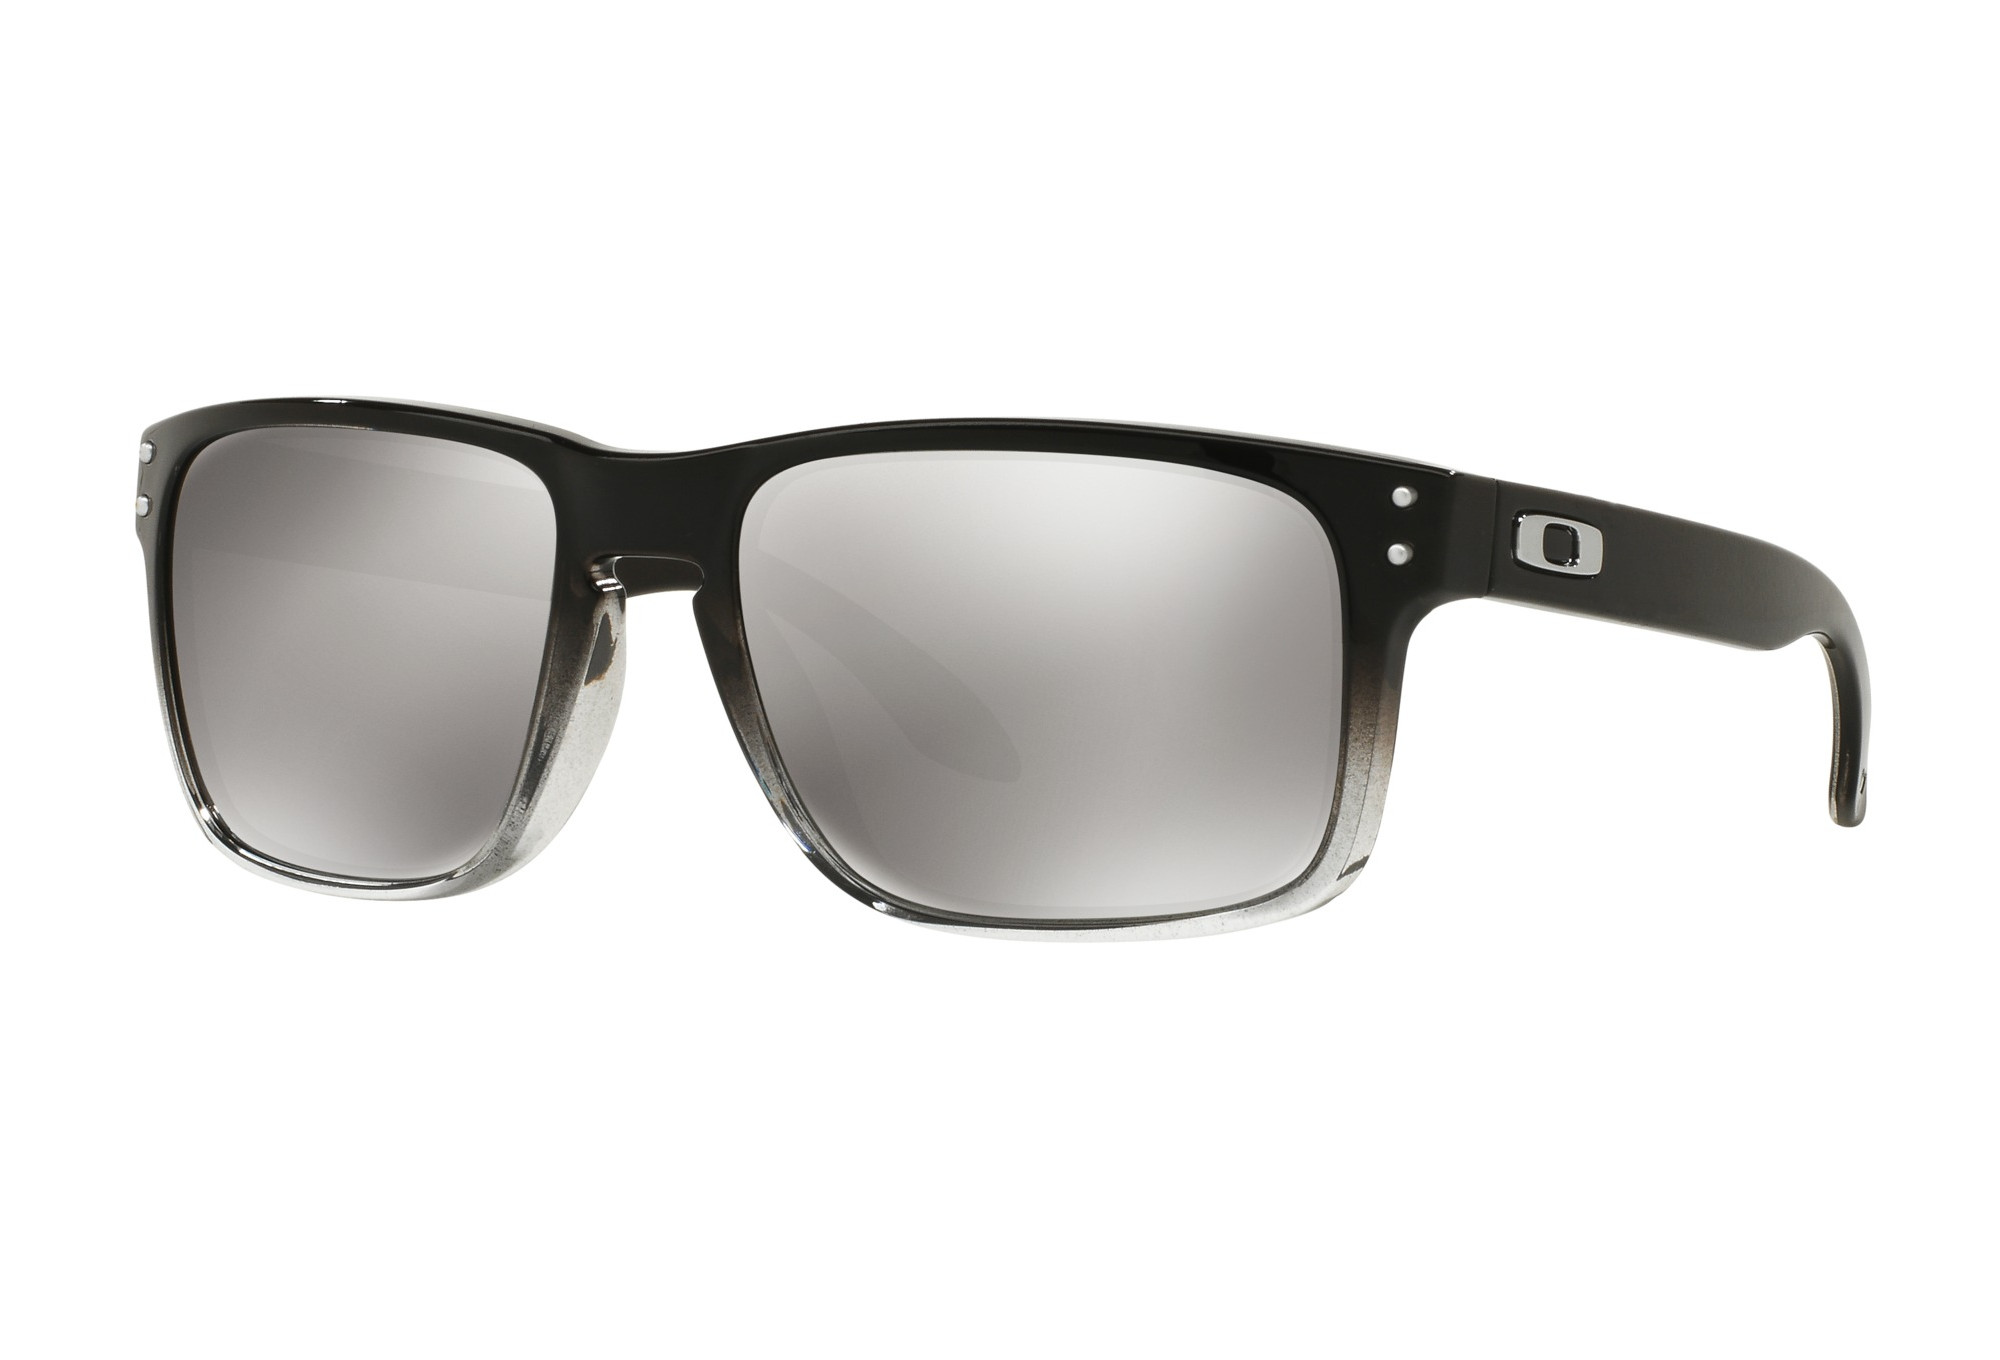 a858de6962ee4 OAKLEY HOLBROOK Sunglasses Dark Ink Fade - Chrome Iridium Polarized Ref  OO9102-A9